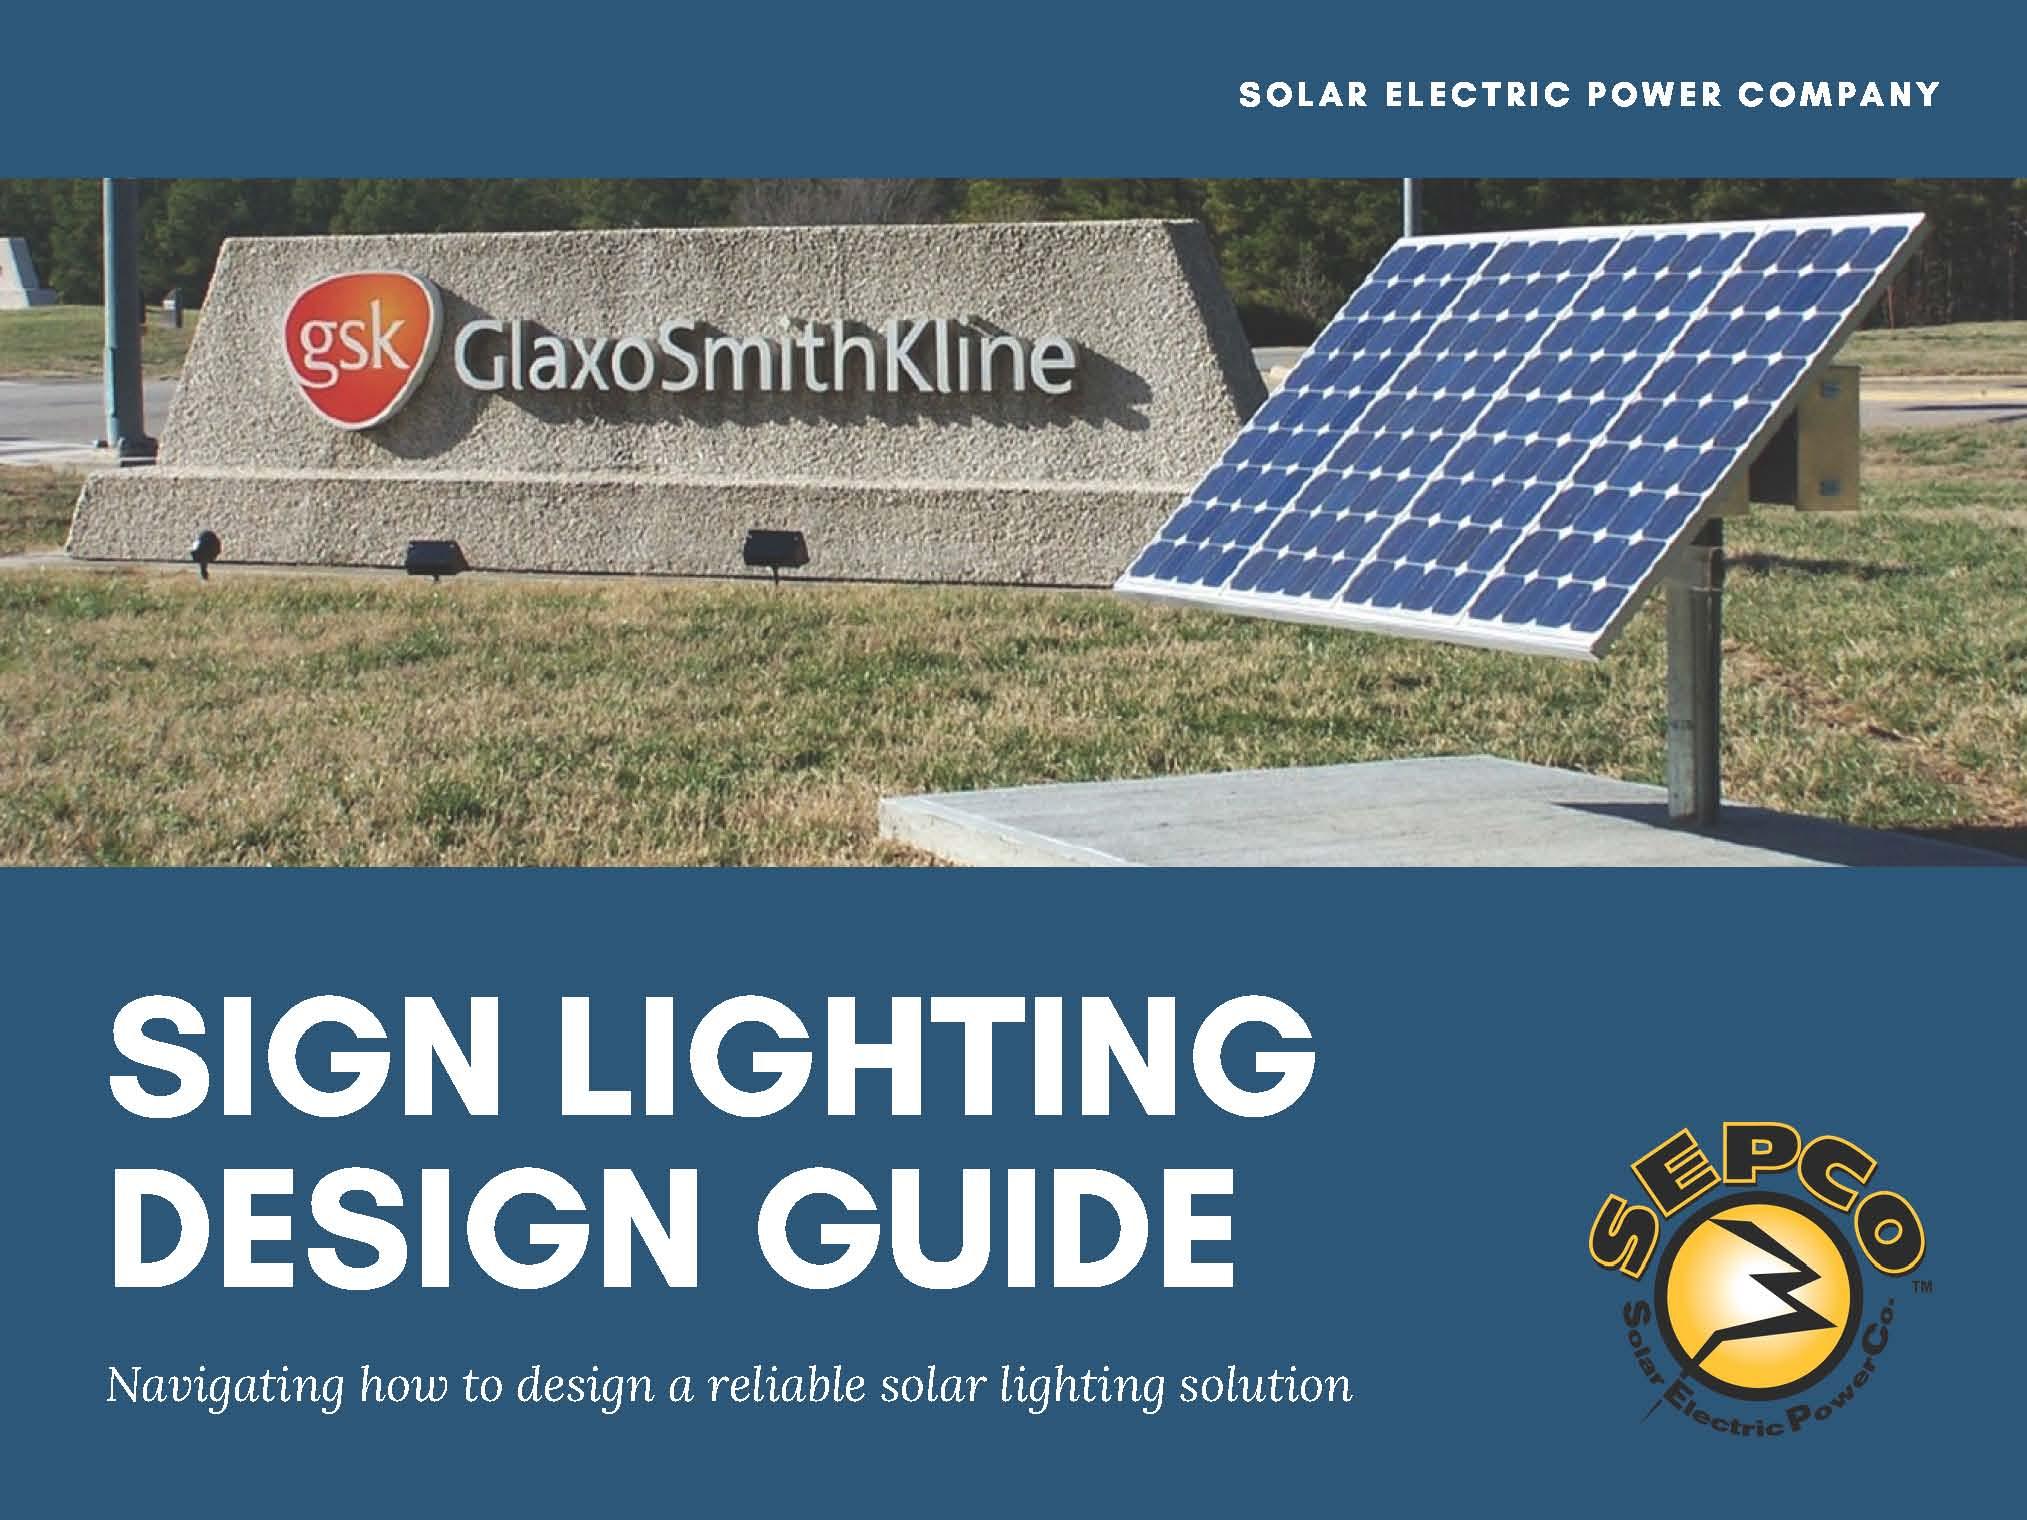 Sign Lighting Design Guide